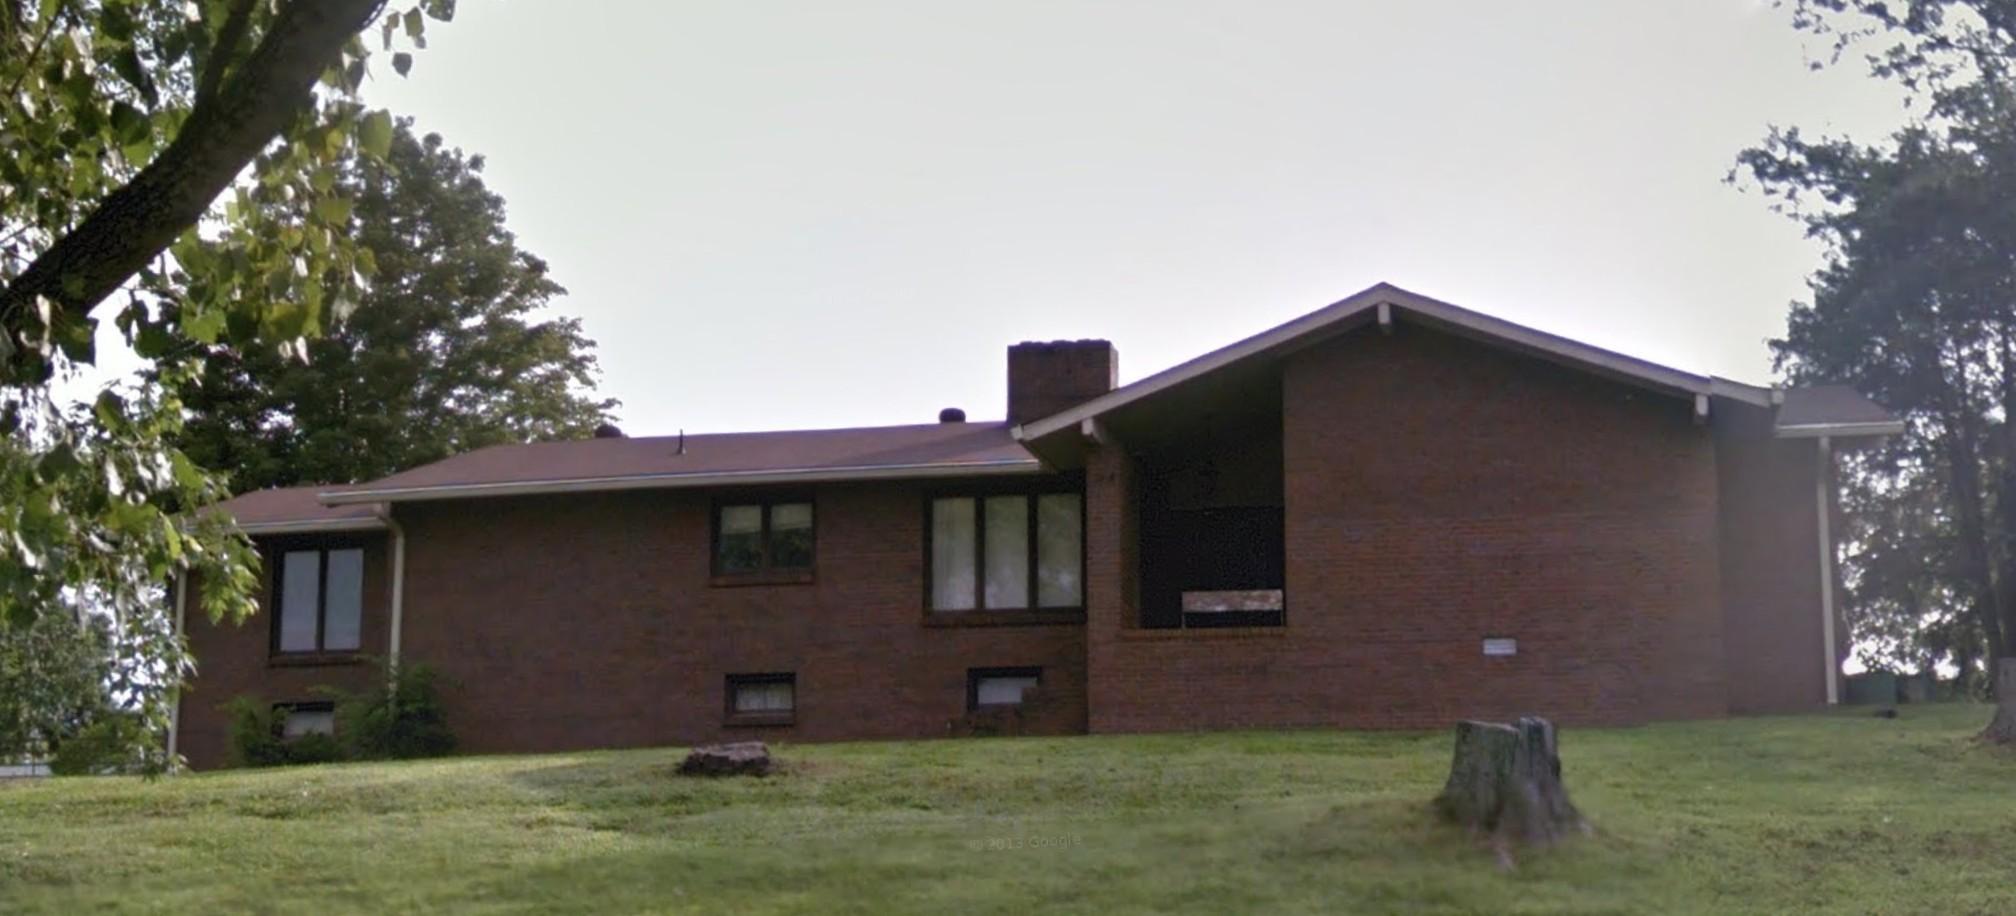 178 Hillcrest Cir Property Photo